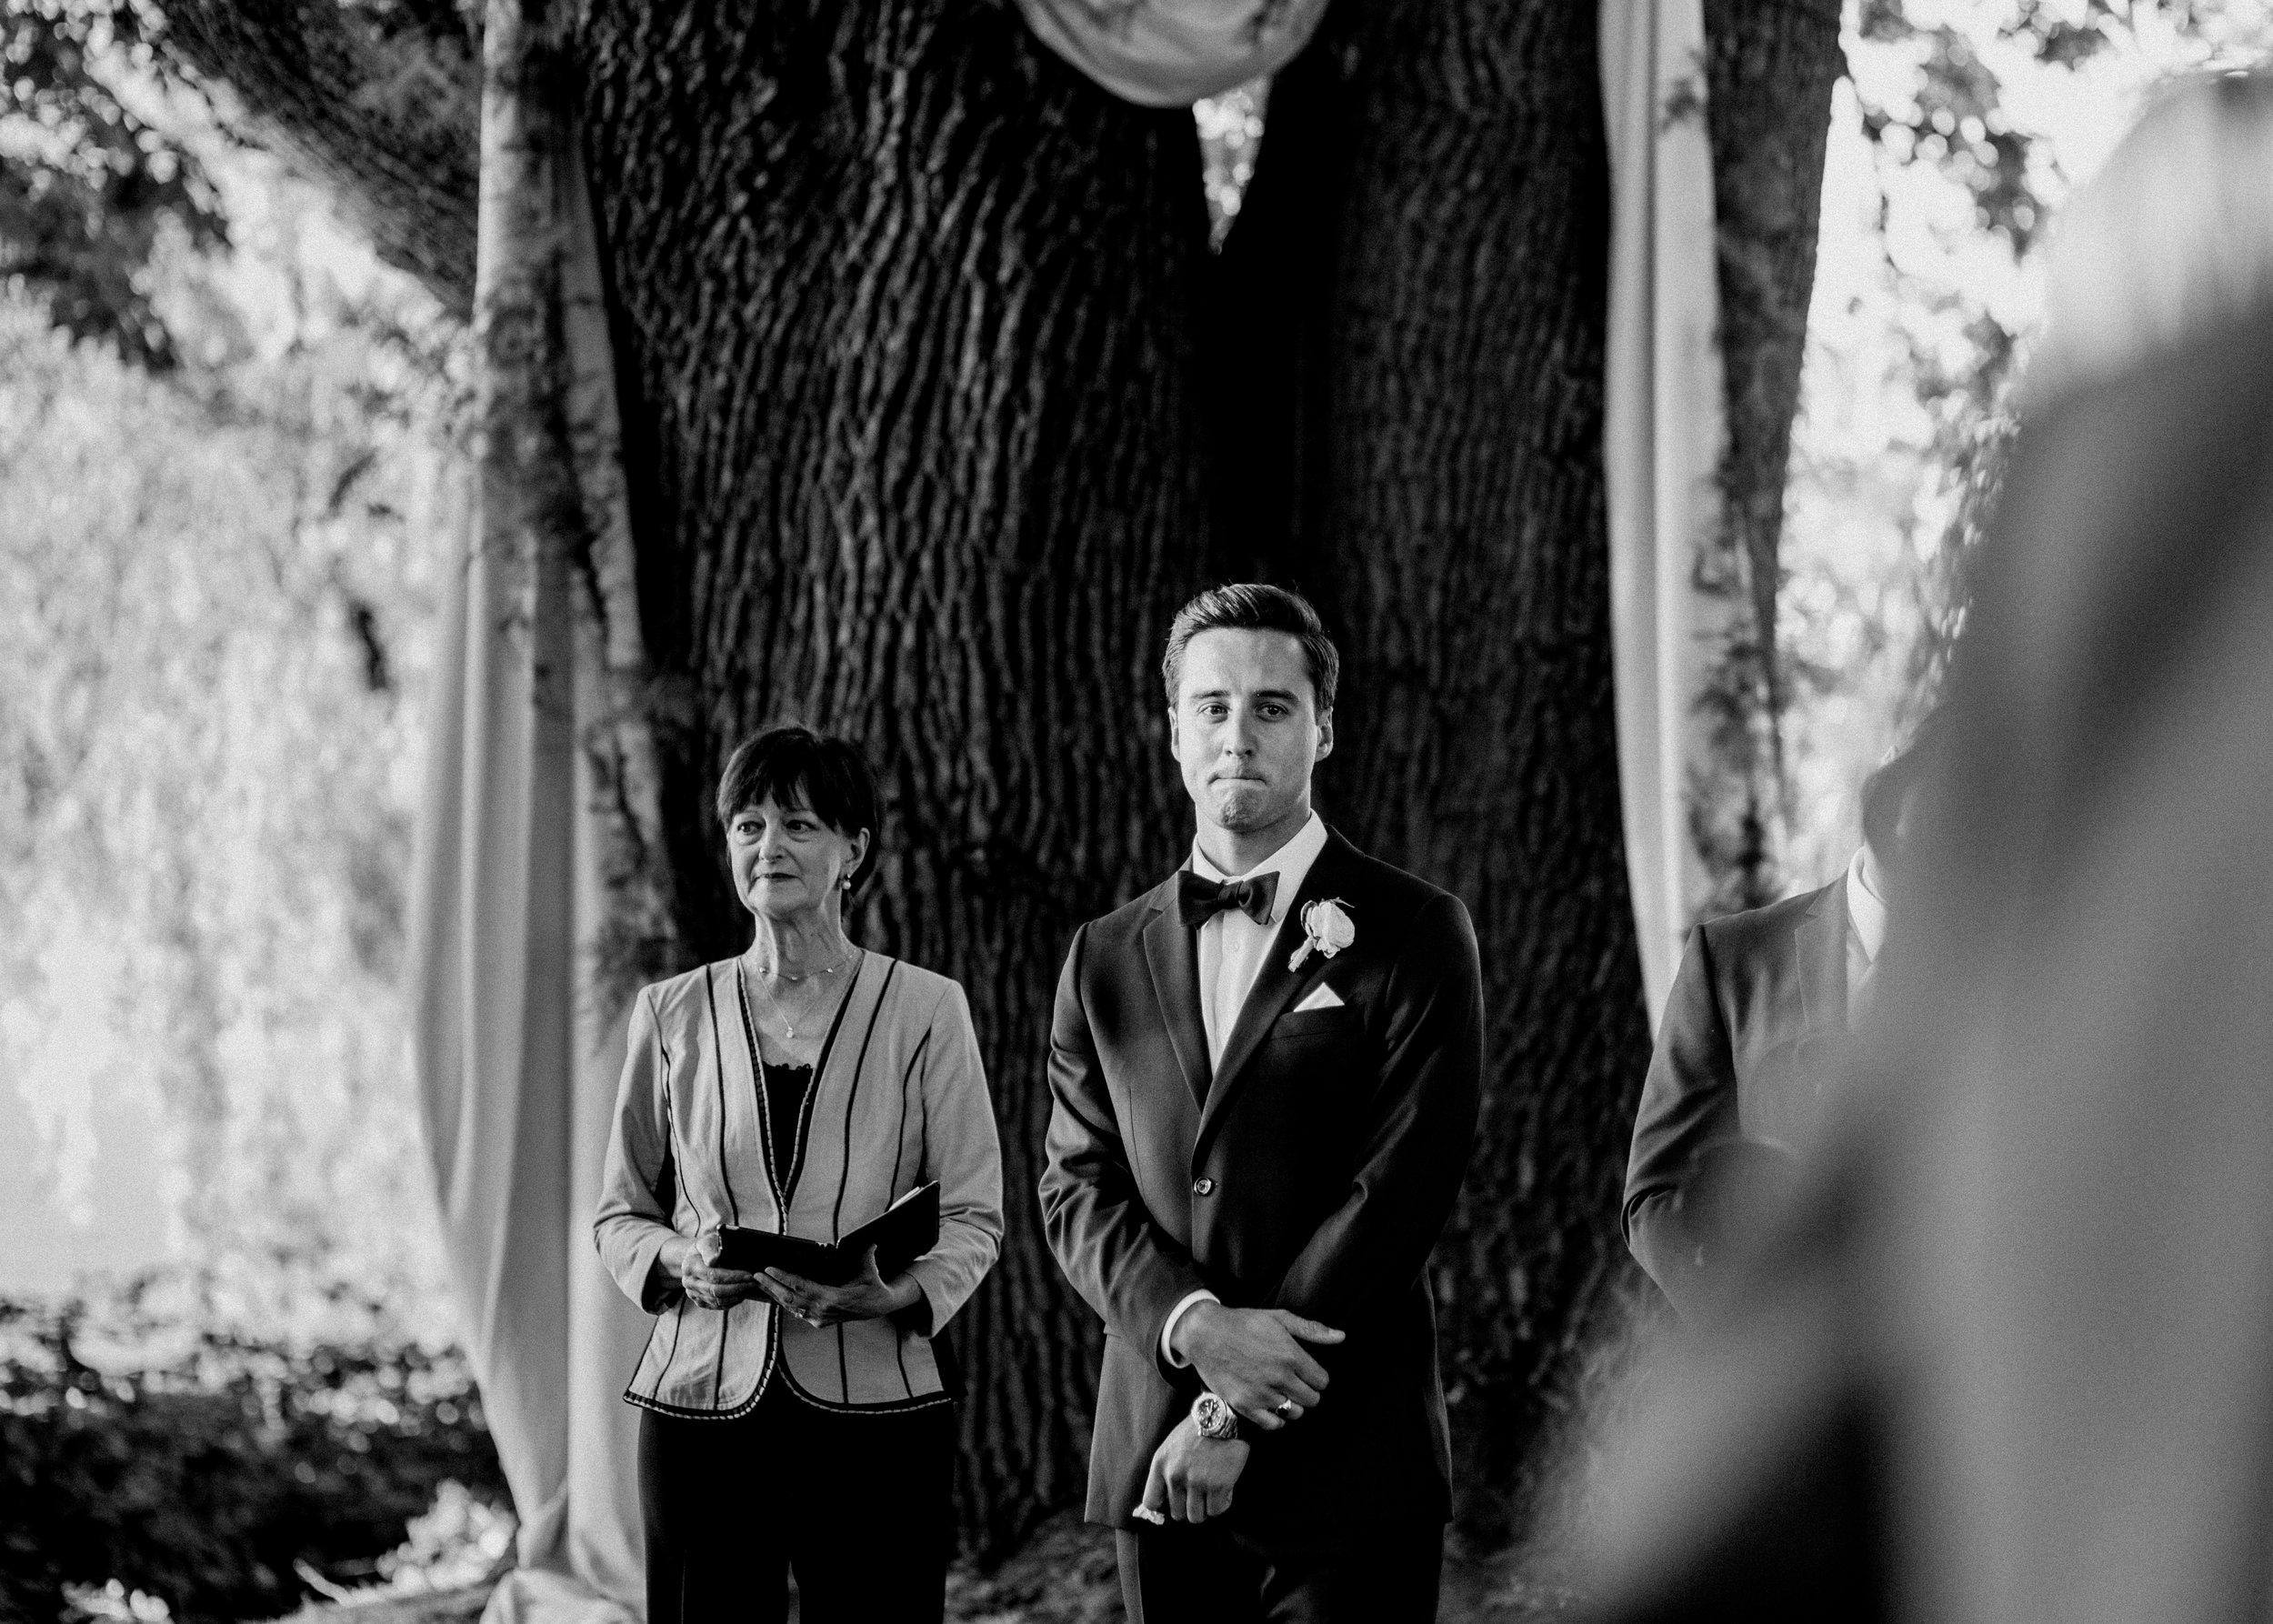 herafilms_carlotta_alex_wedding_hera_highres-44.jpg